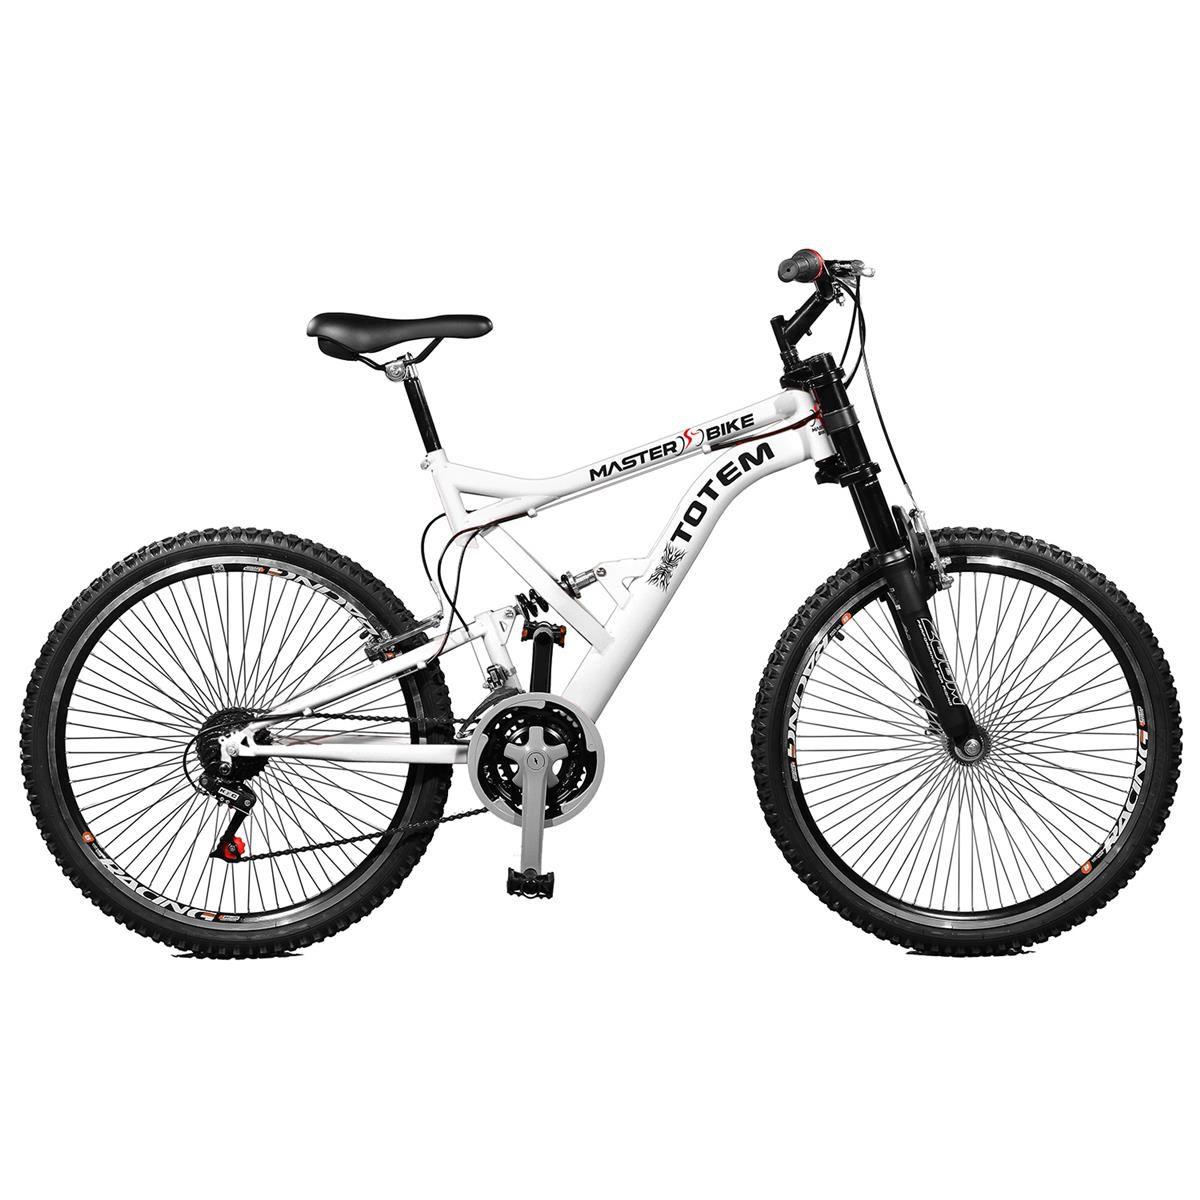 Bicicleta Master Bike Aro 26 Totem Suspensão Full Dupla Alta A-72 Branco